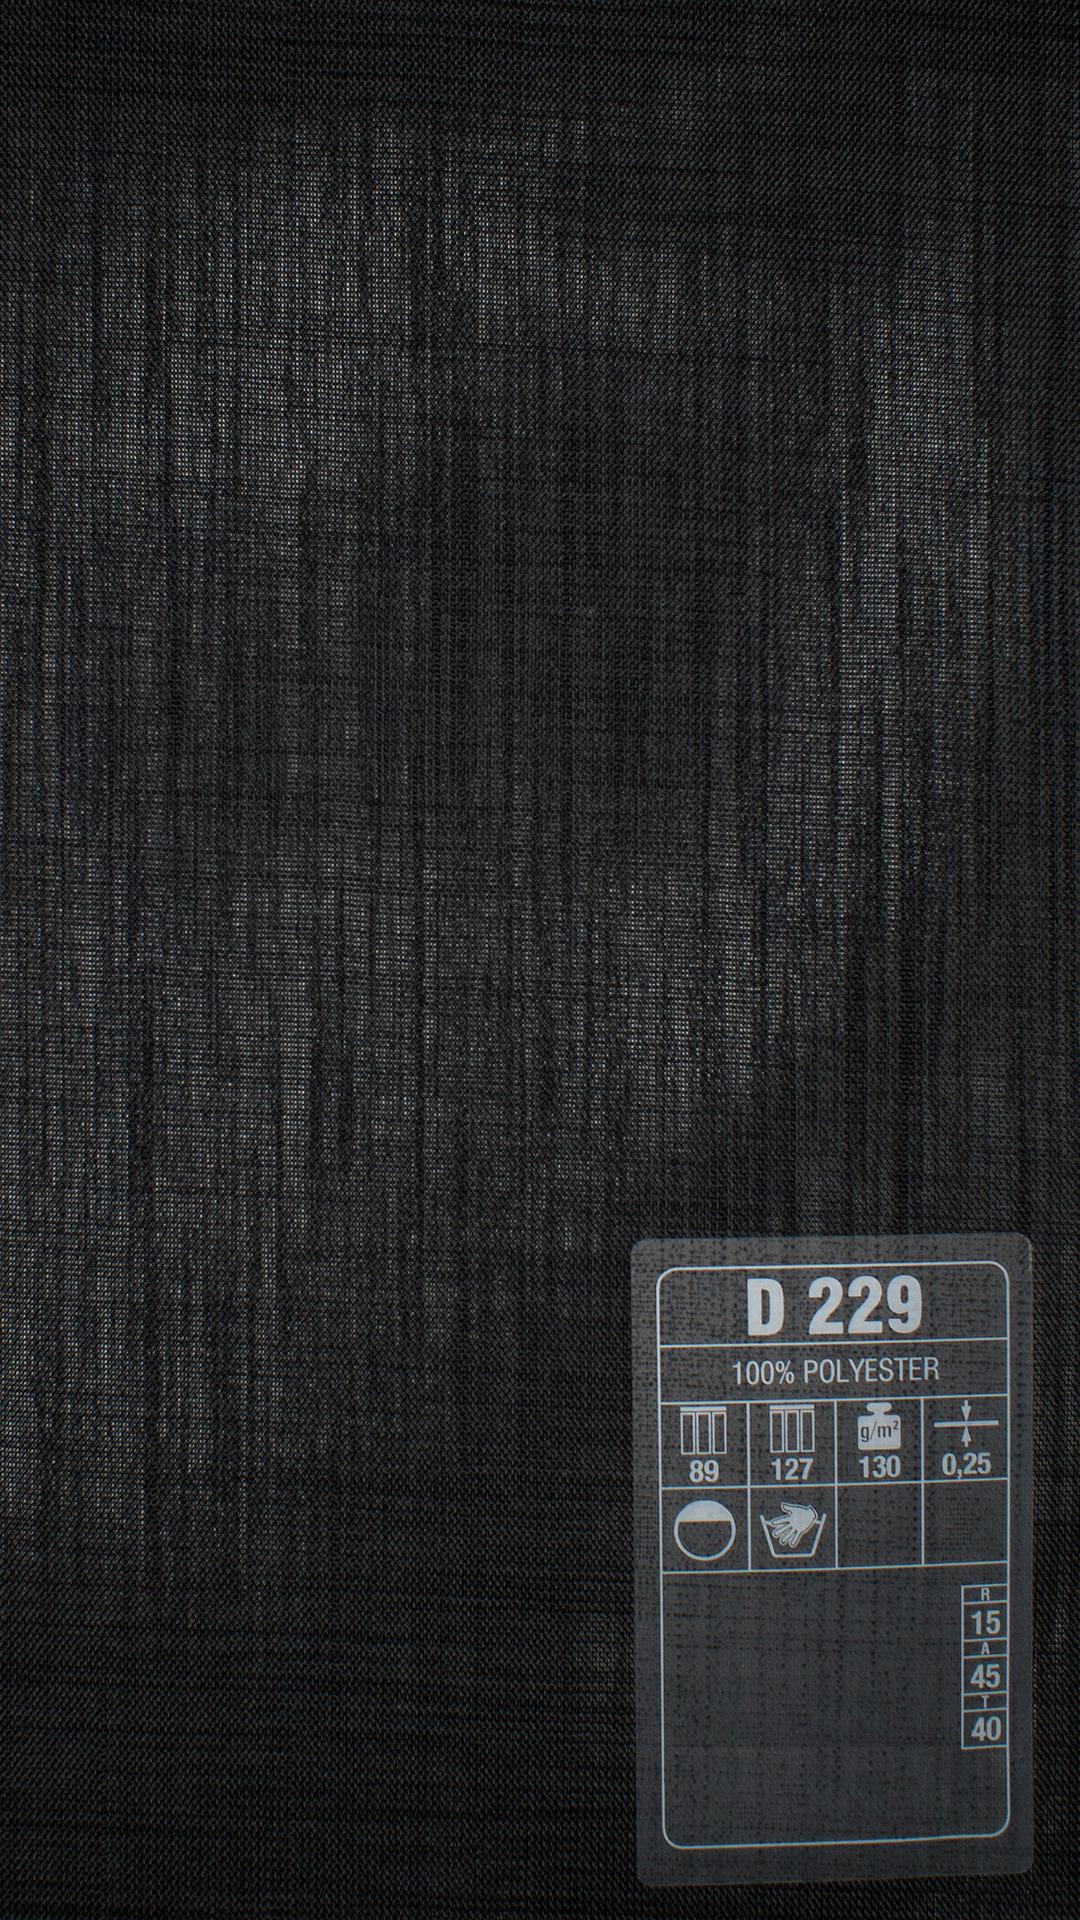 D 229